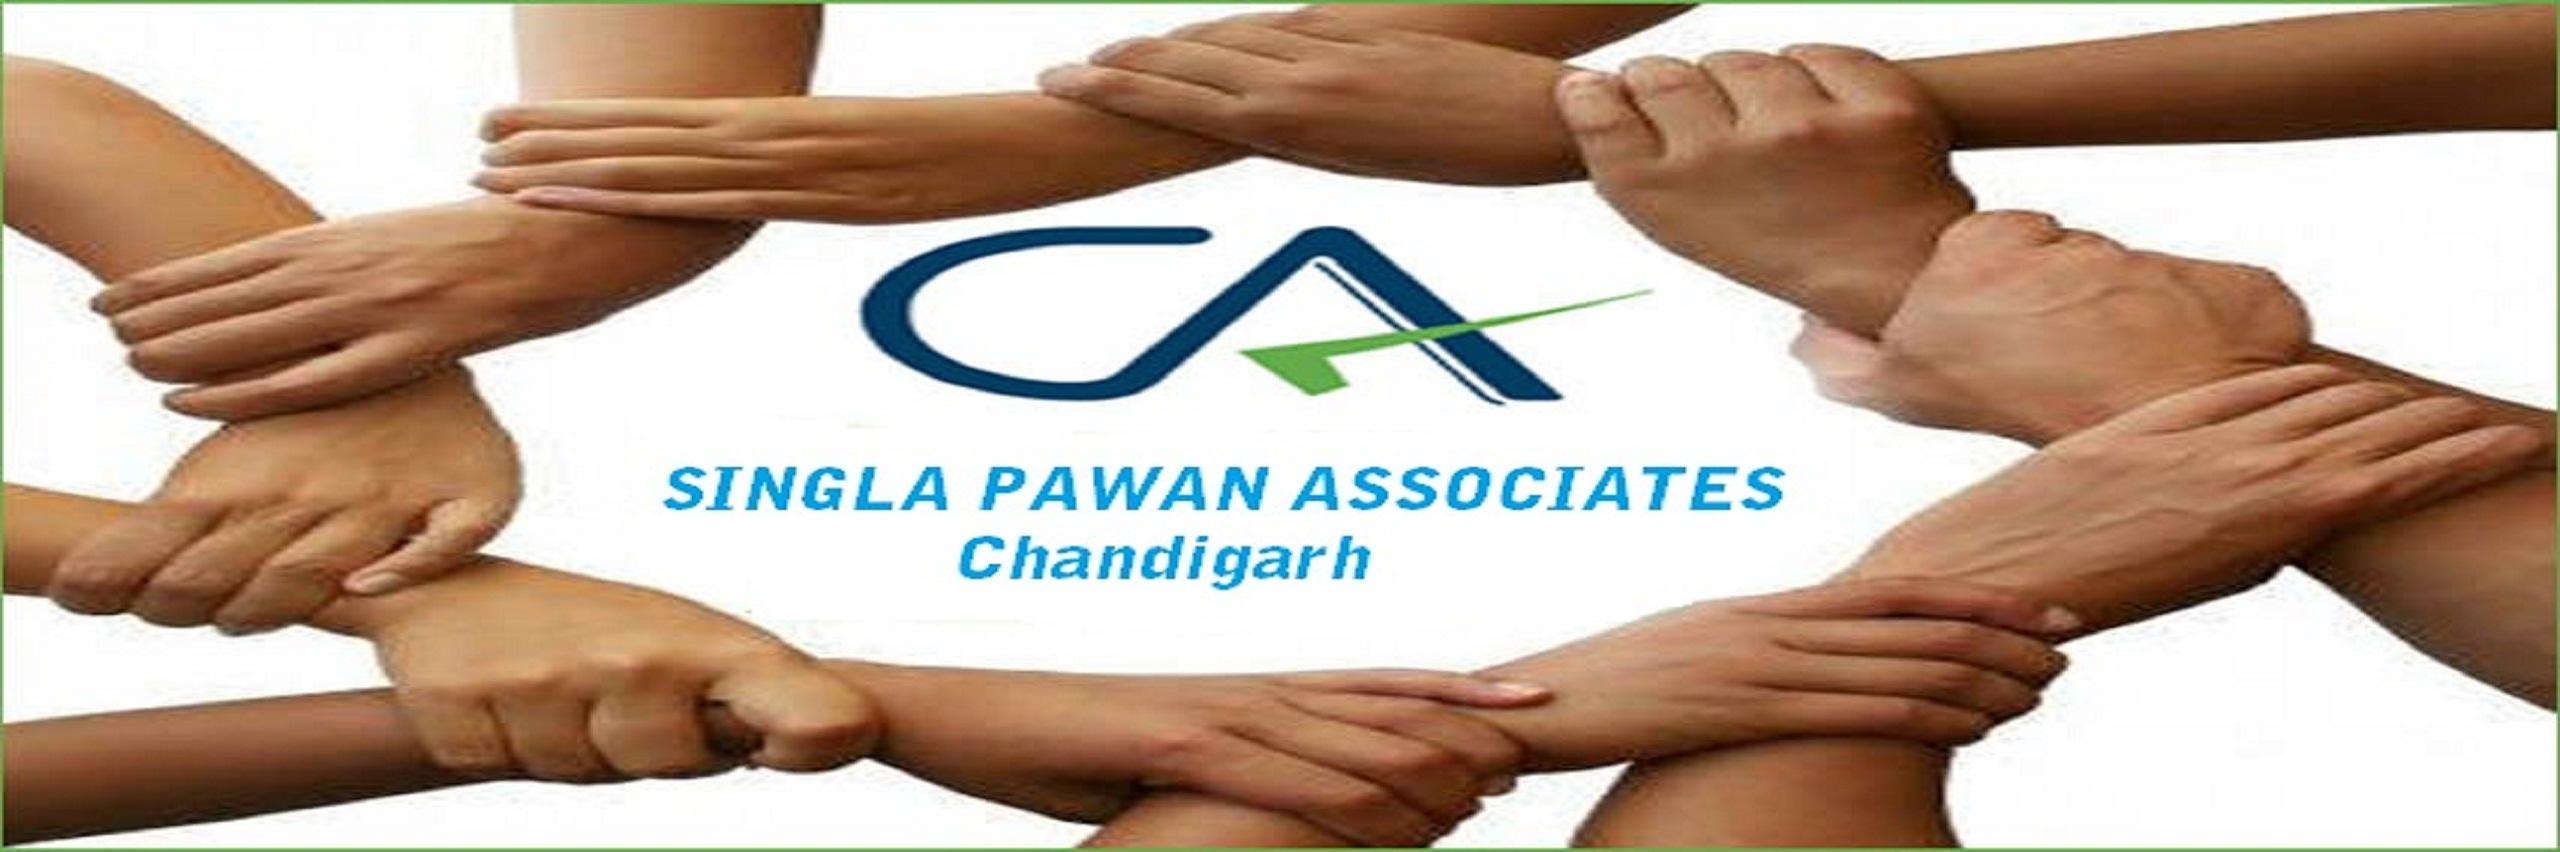 Singla Pawan Associates